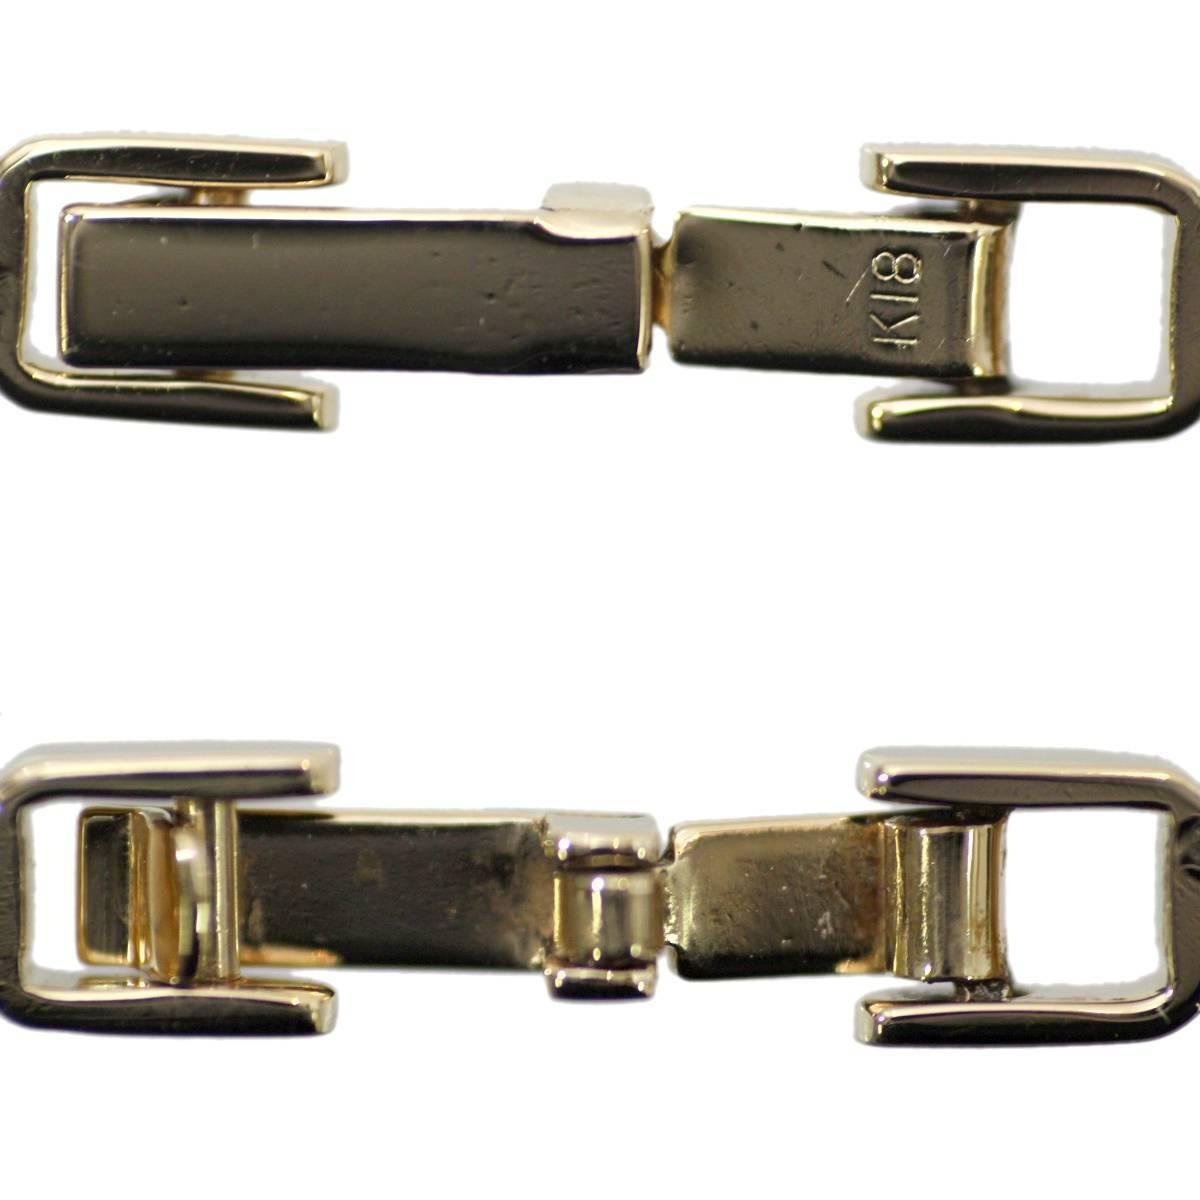 K18 18金 ゴールド 喜平 2面 ネックレス チェーン 66cm 41.3g KA 磨き仕上げ品 Aランク_画像6